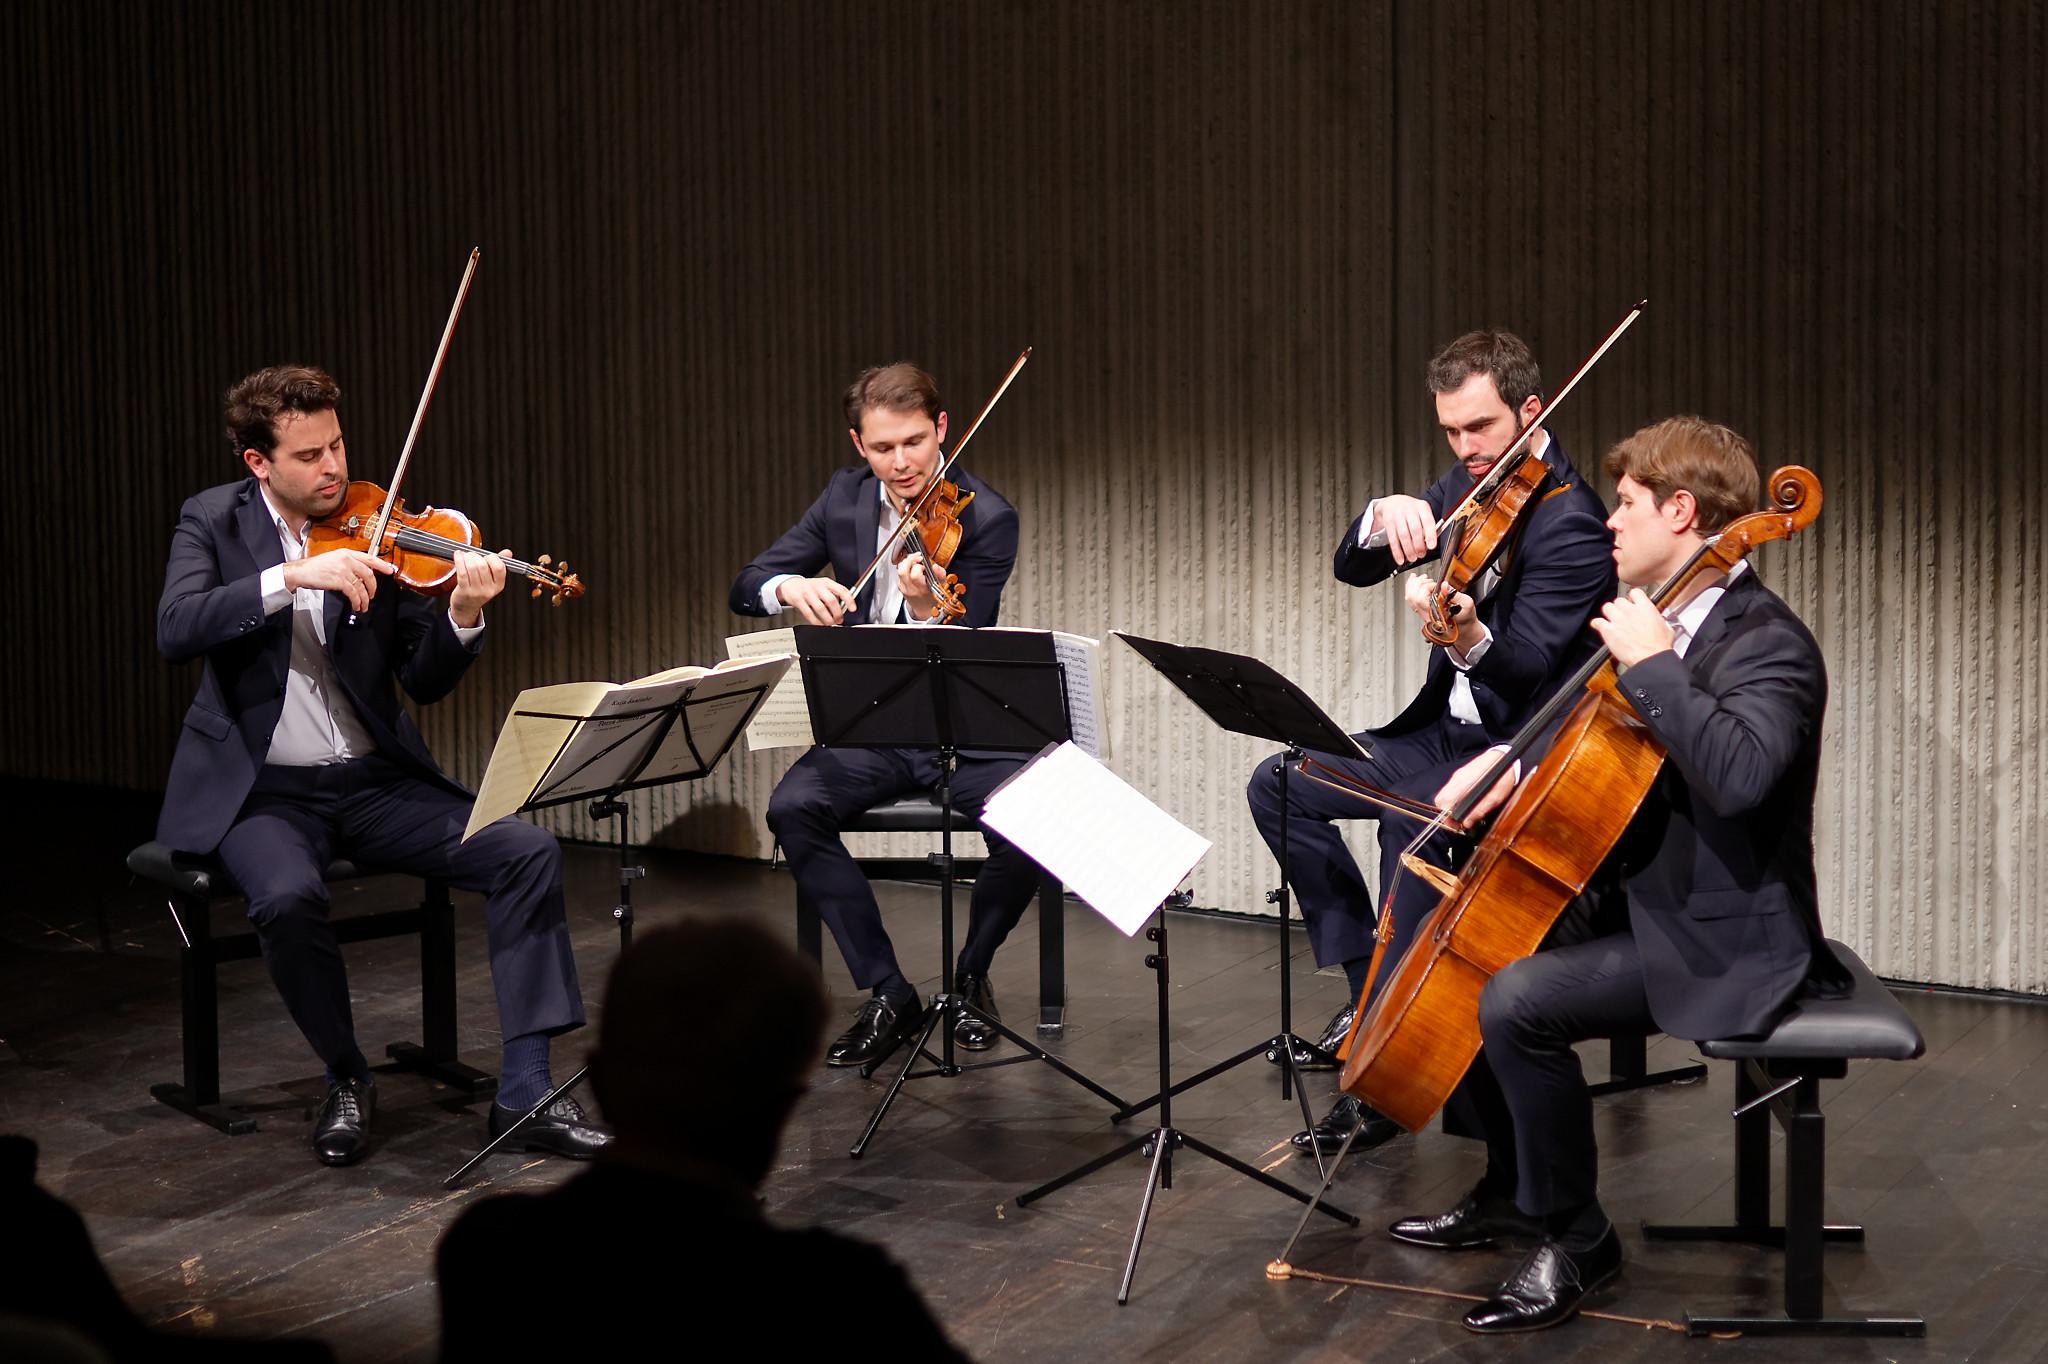 Quatuor Modigliani, Lugano, 2019-03-17 (© Rolf Kyburz)